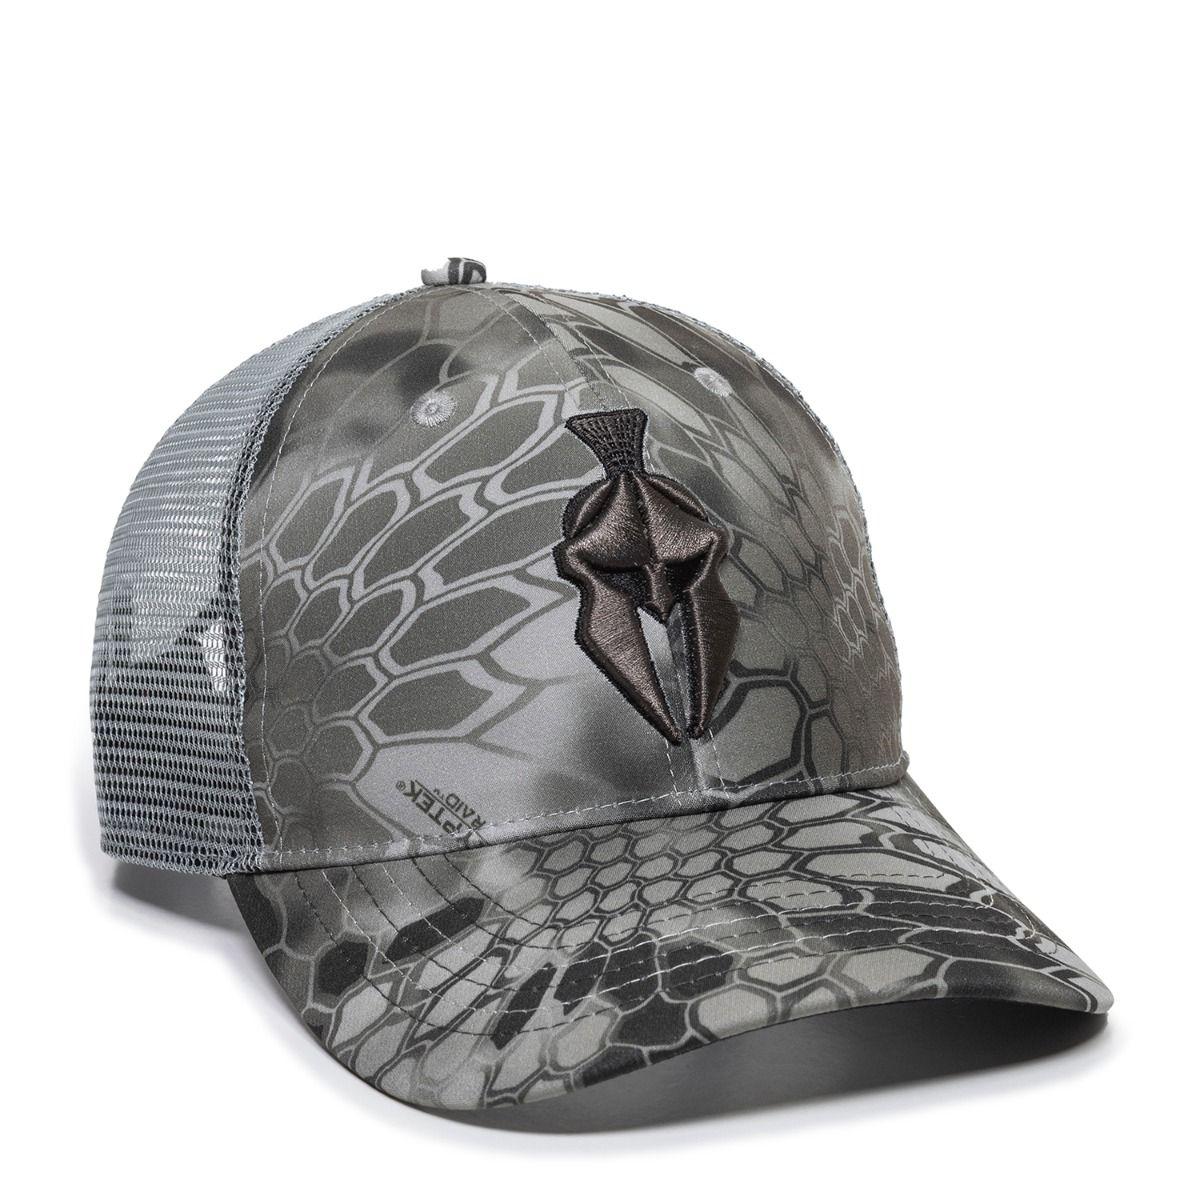 Chevy Kryptek® Raid™ Mesh Back Camo Cap